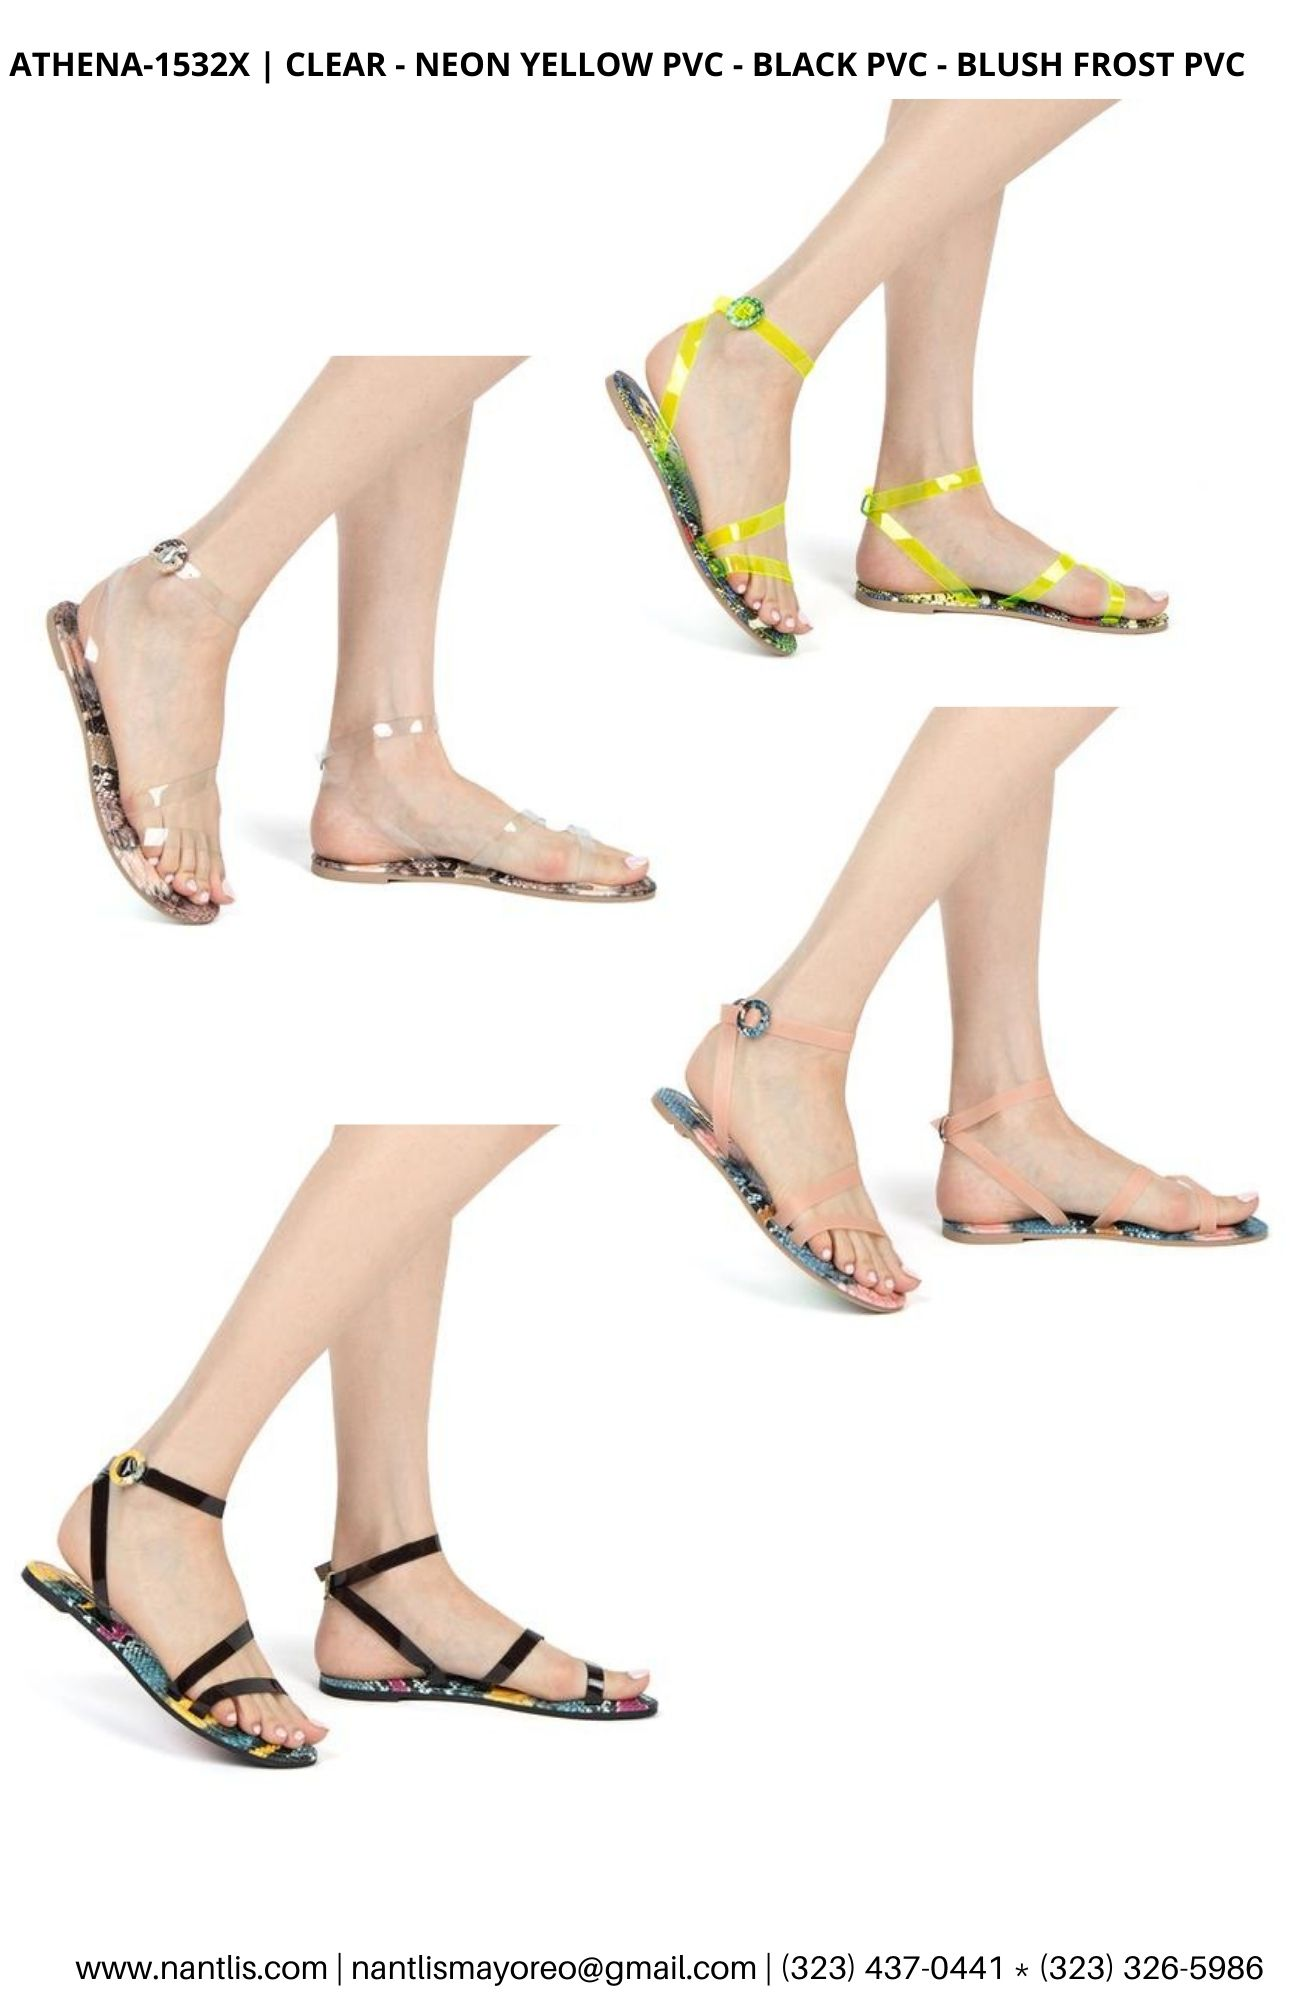 Catalogo Vol QU44 Sandalias de mujer mayoreo Wholesale Sandals page 05